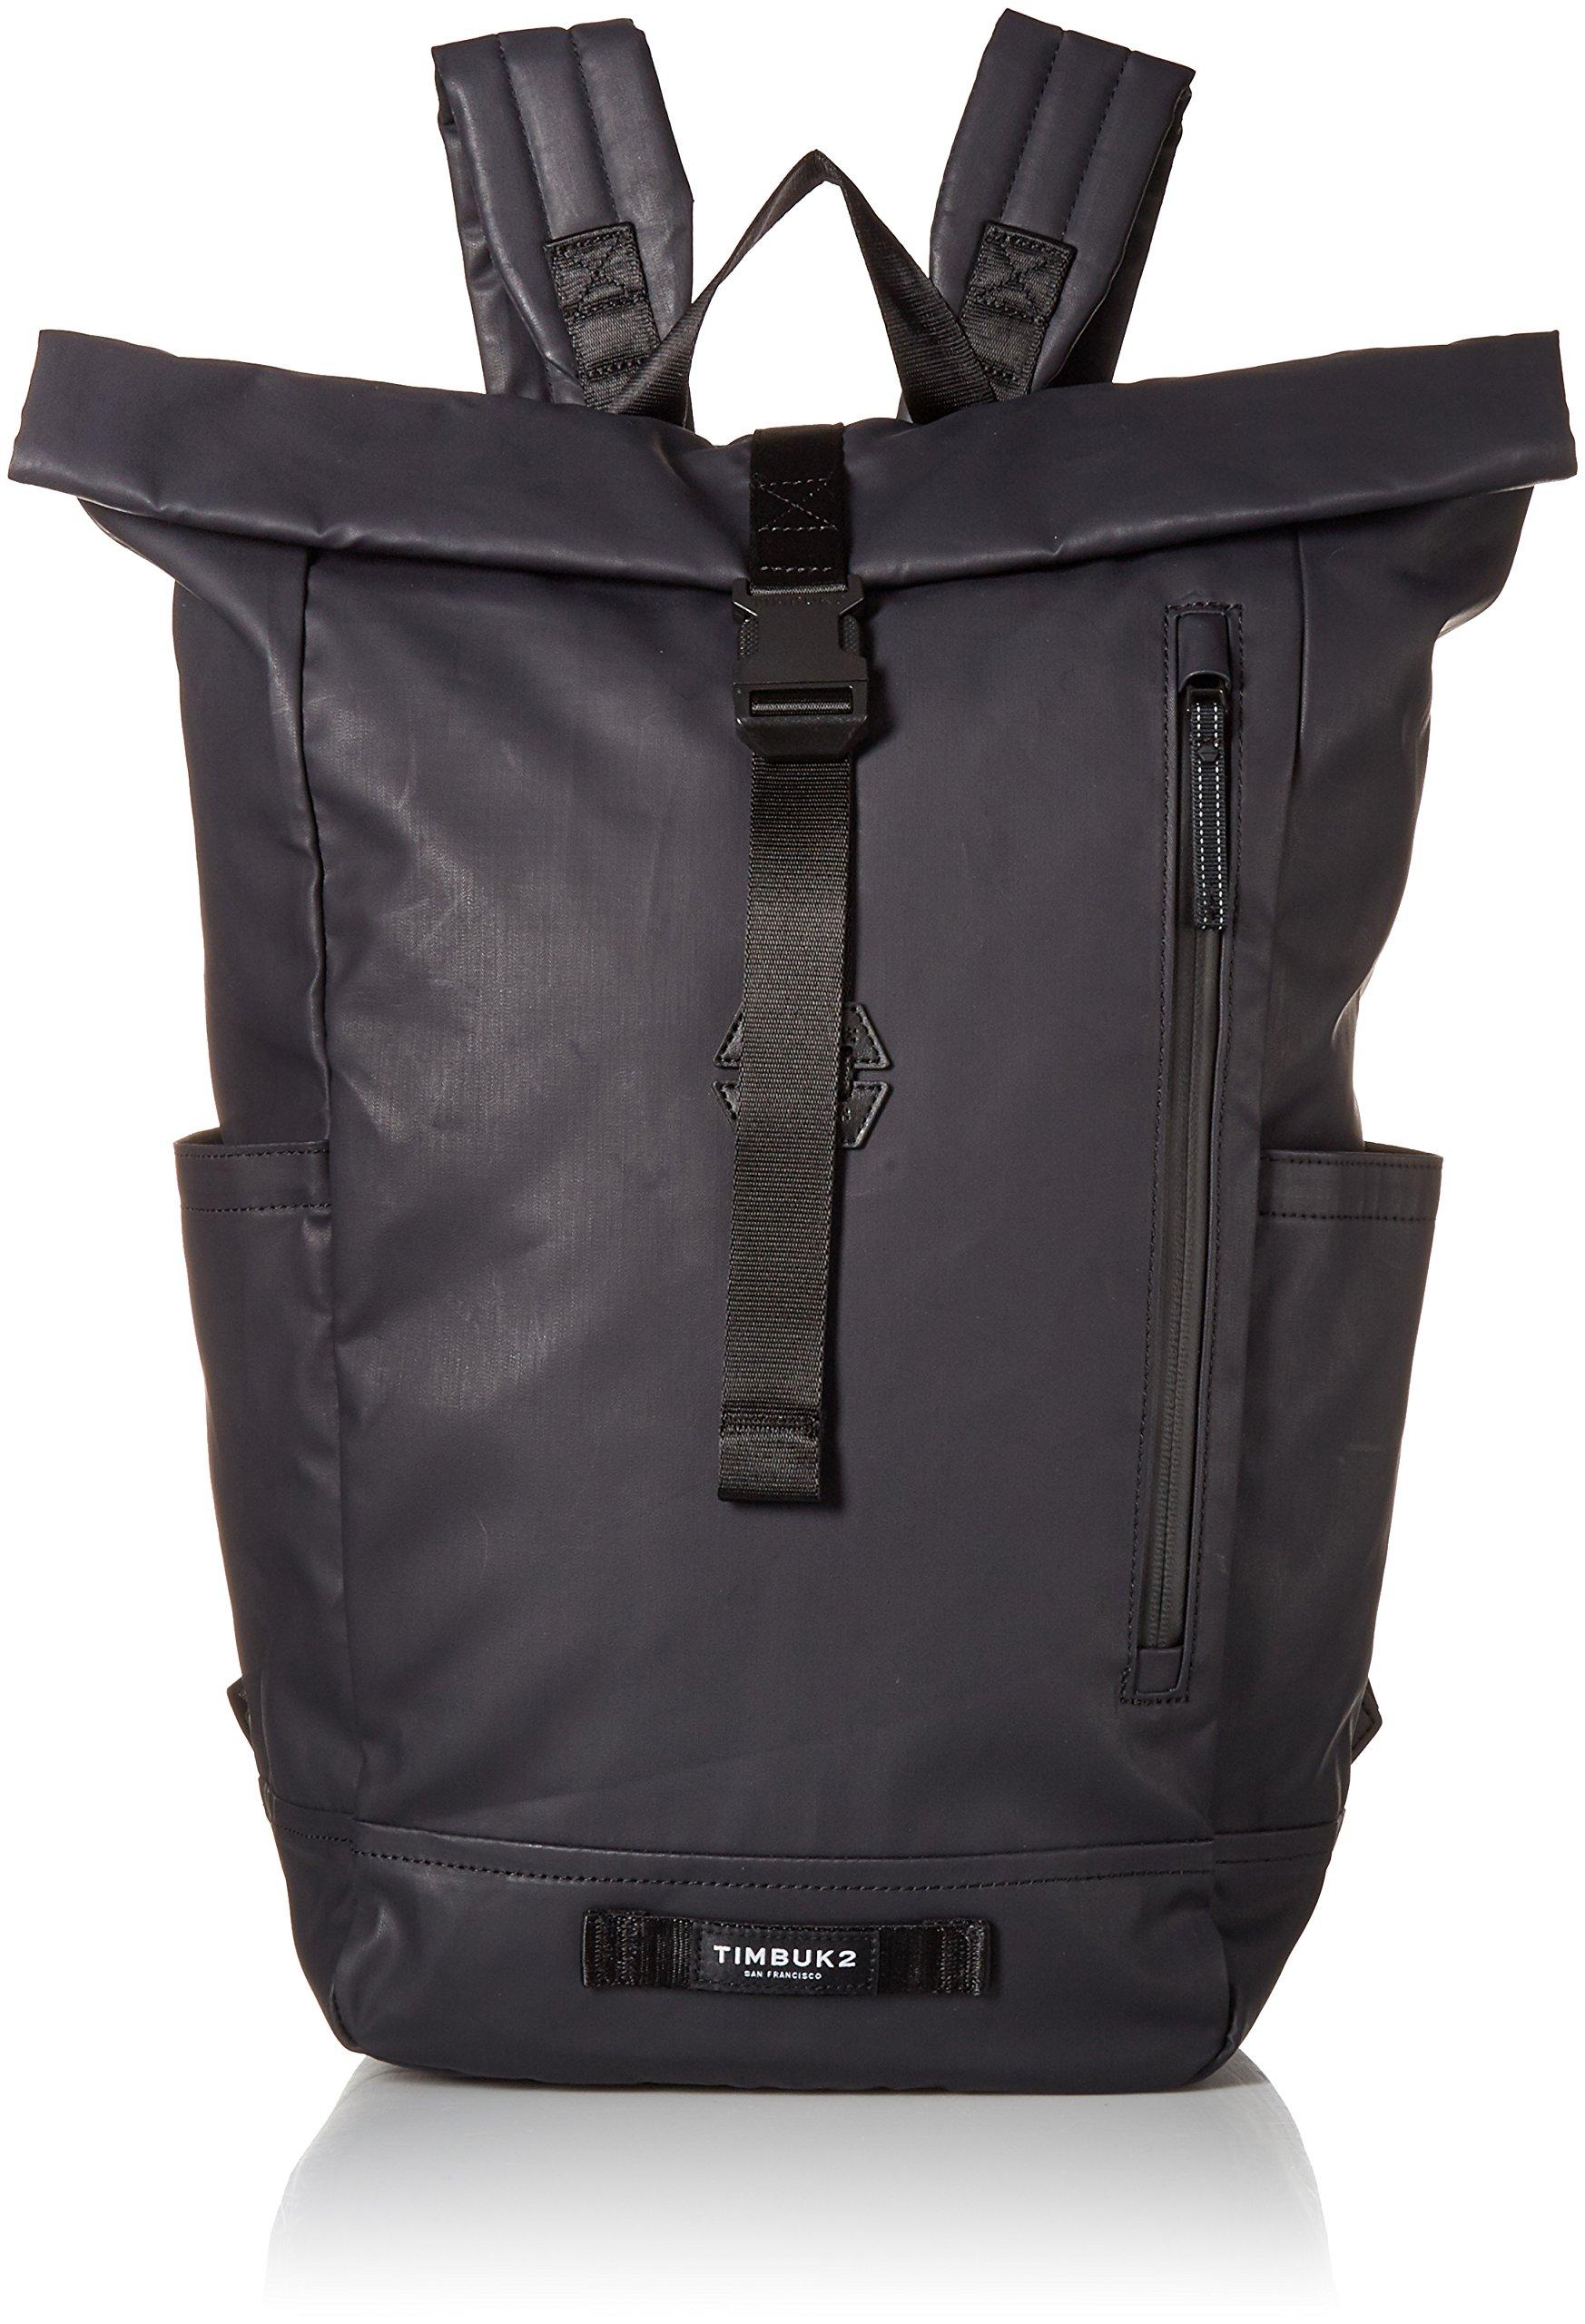 Timbuk2 Tuck Pack Twill, OS, Jet Black, One Size